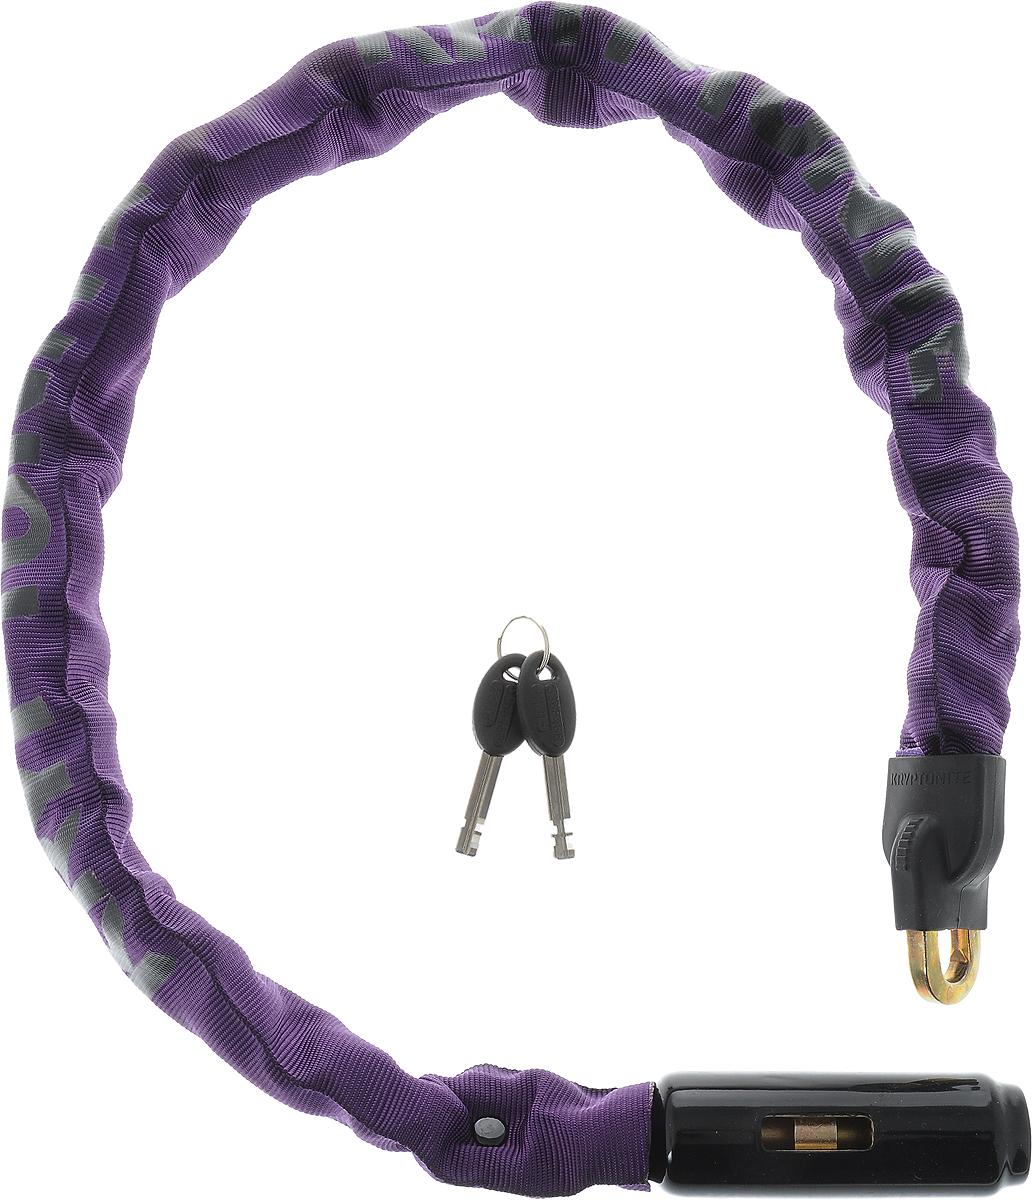 Замок велосипедный Kryptonite Chains Keeper 785 Integrated Chain, цвет: фиолетовый, черный